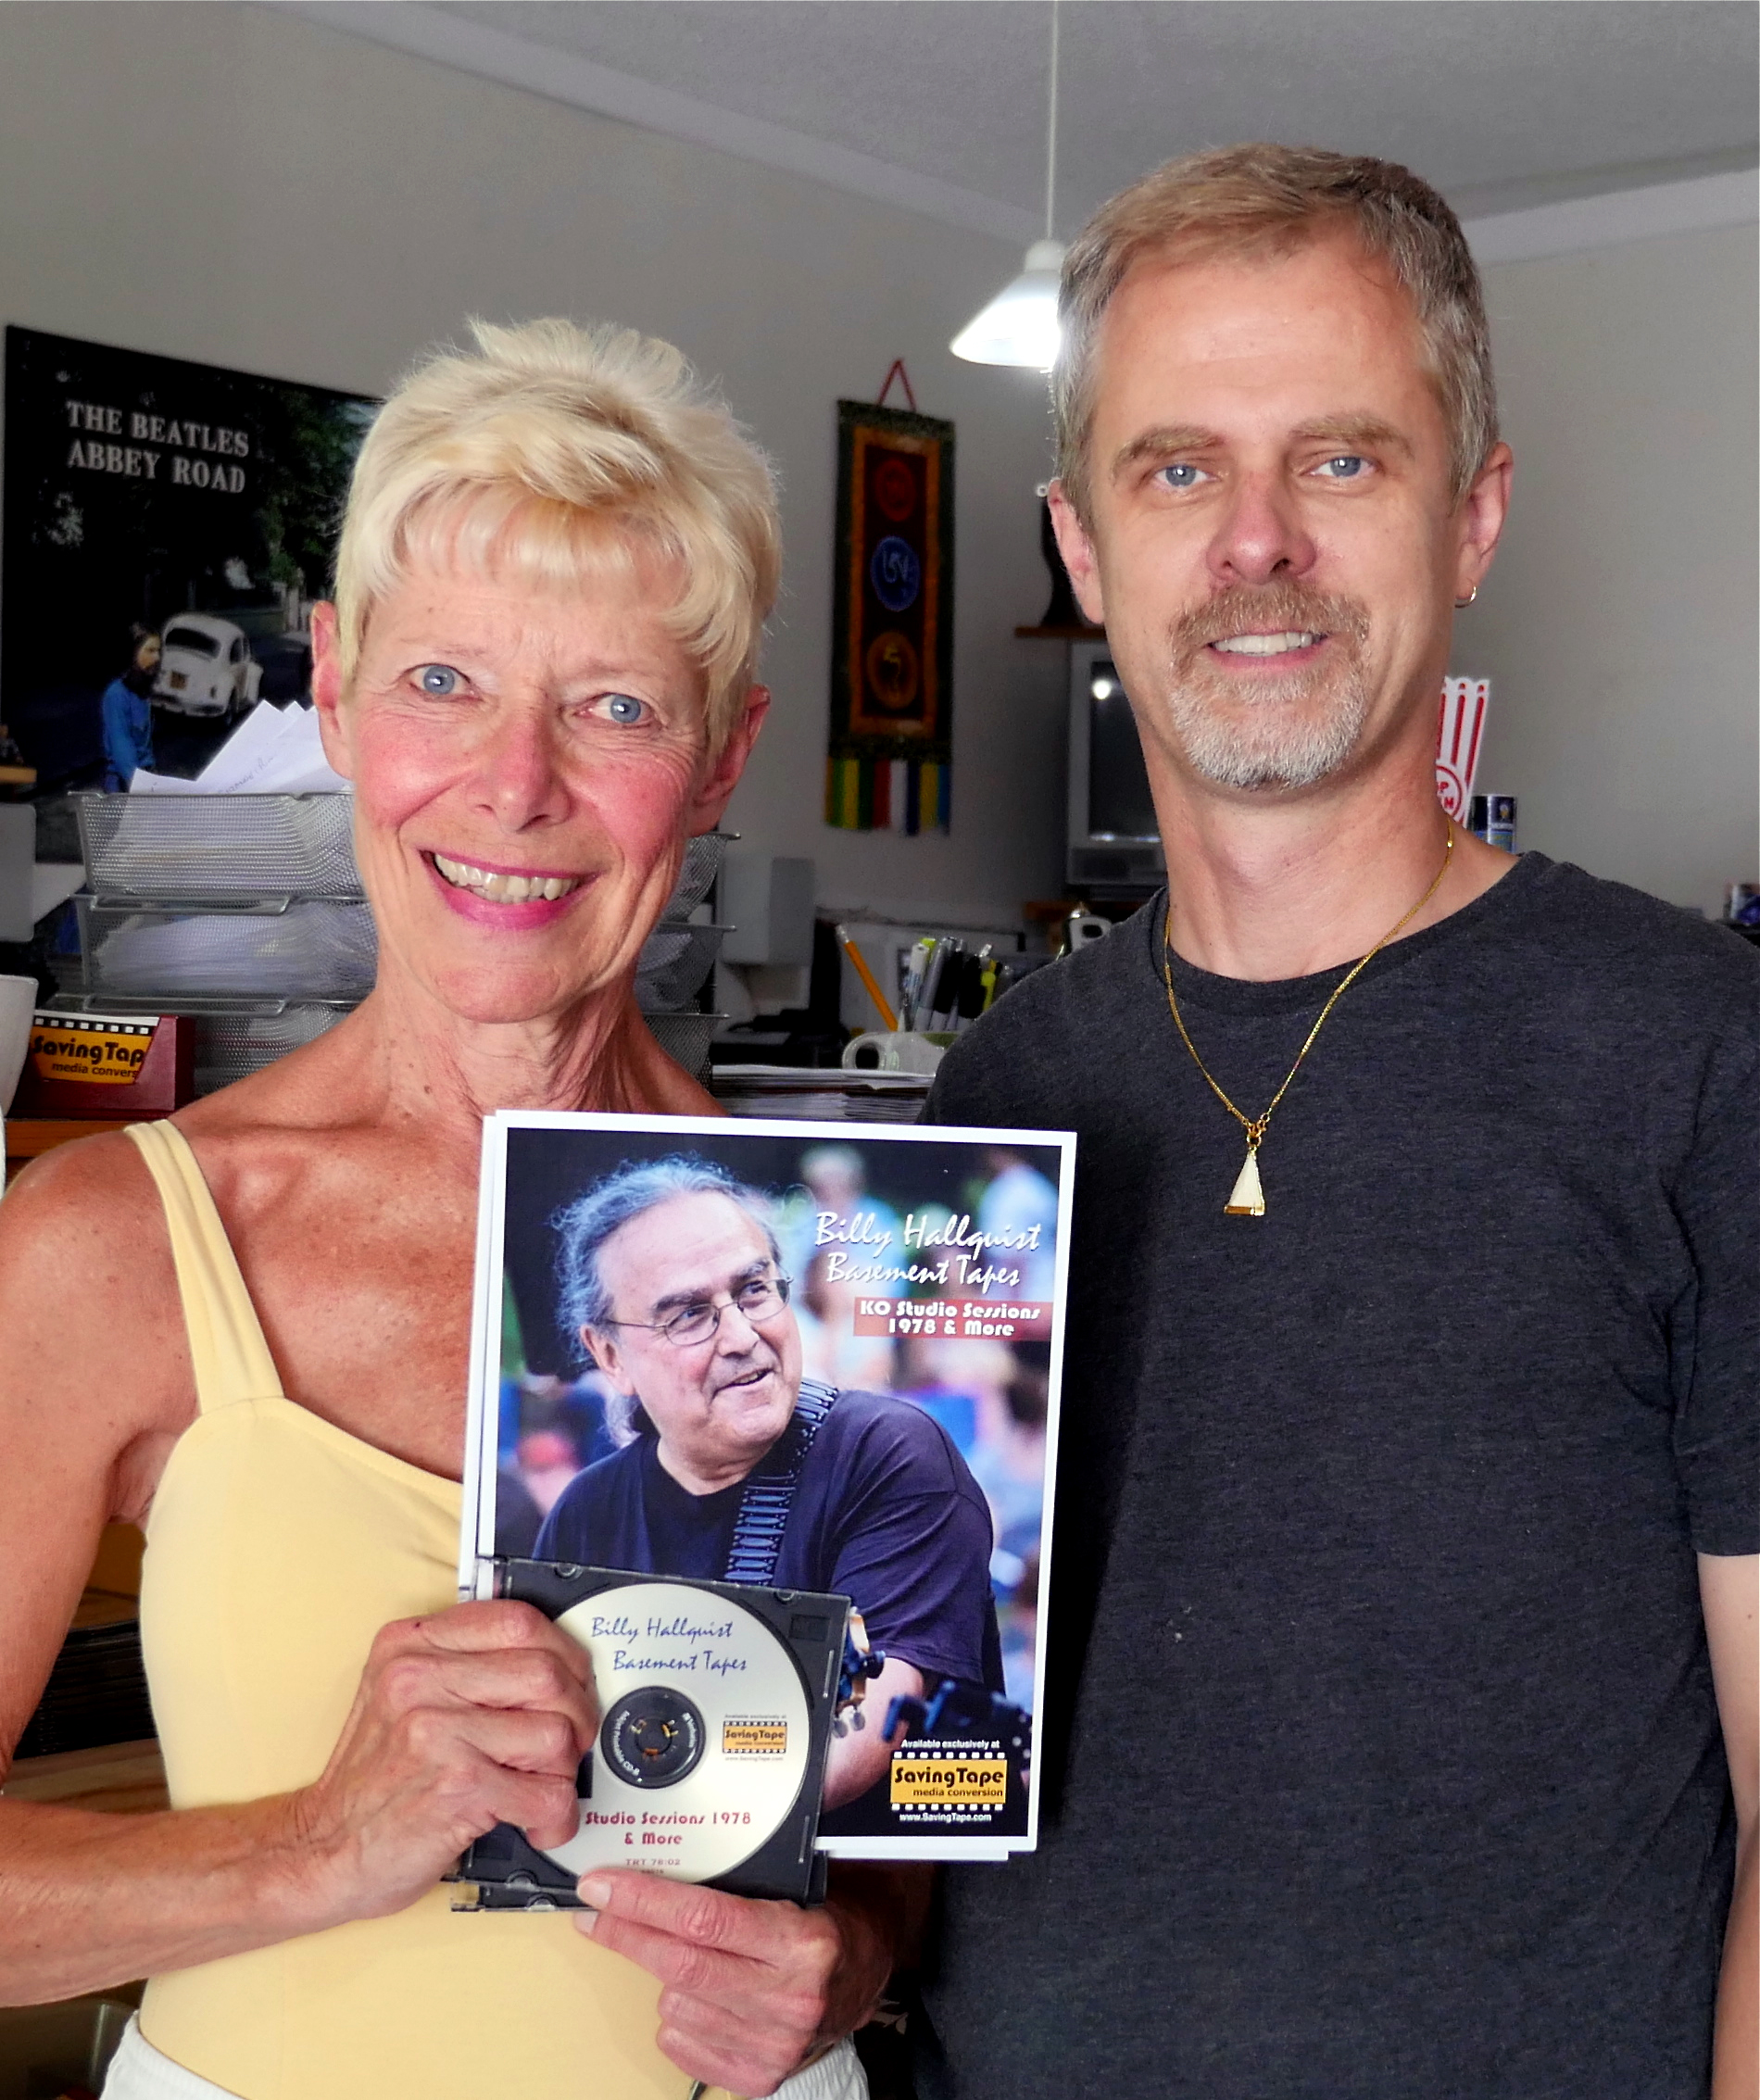 Billy Hallquist Basement Tapes - Carol Thomas and Thor Anderson / Saving Tape  / Minneapolis, Minnesota / August 1st, 2016